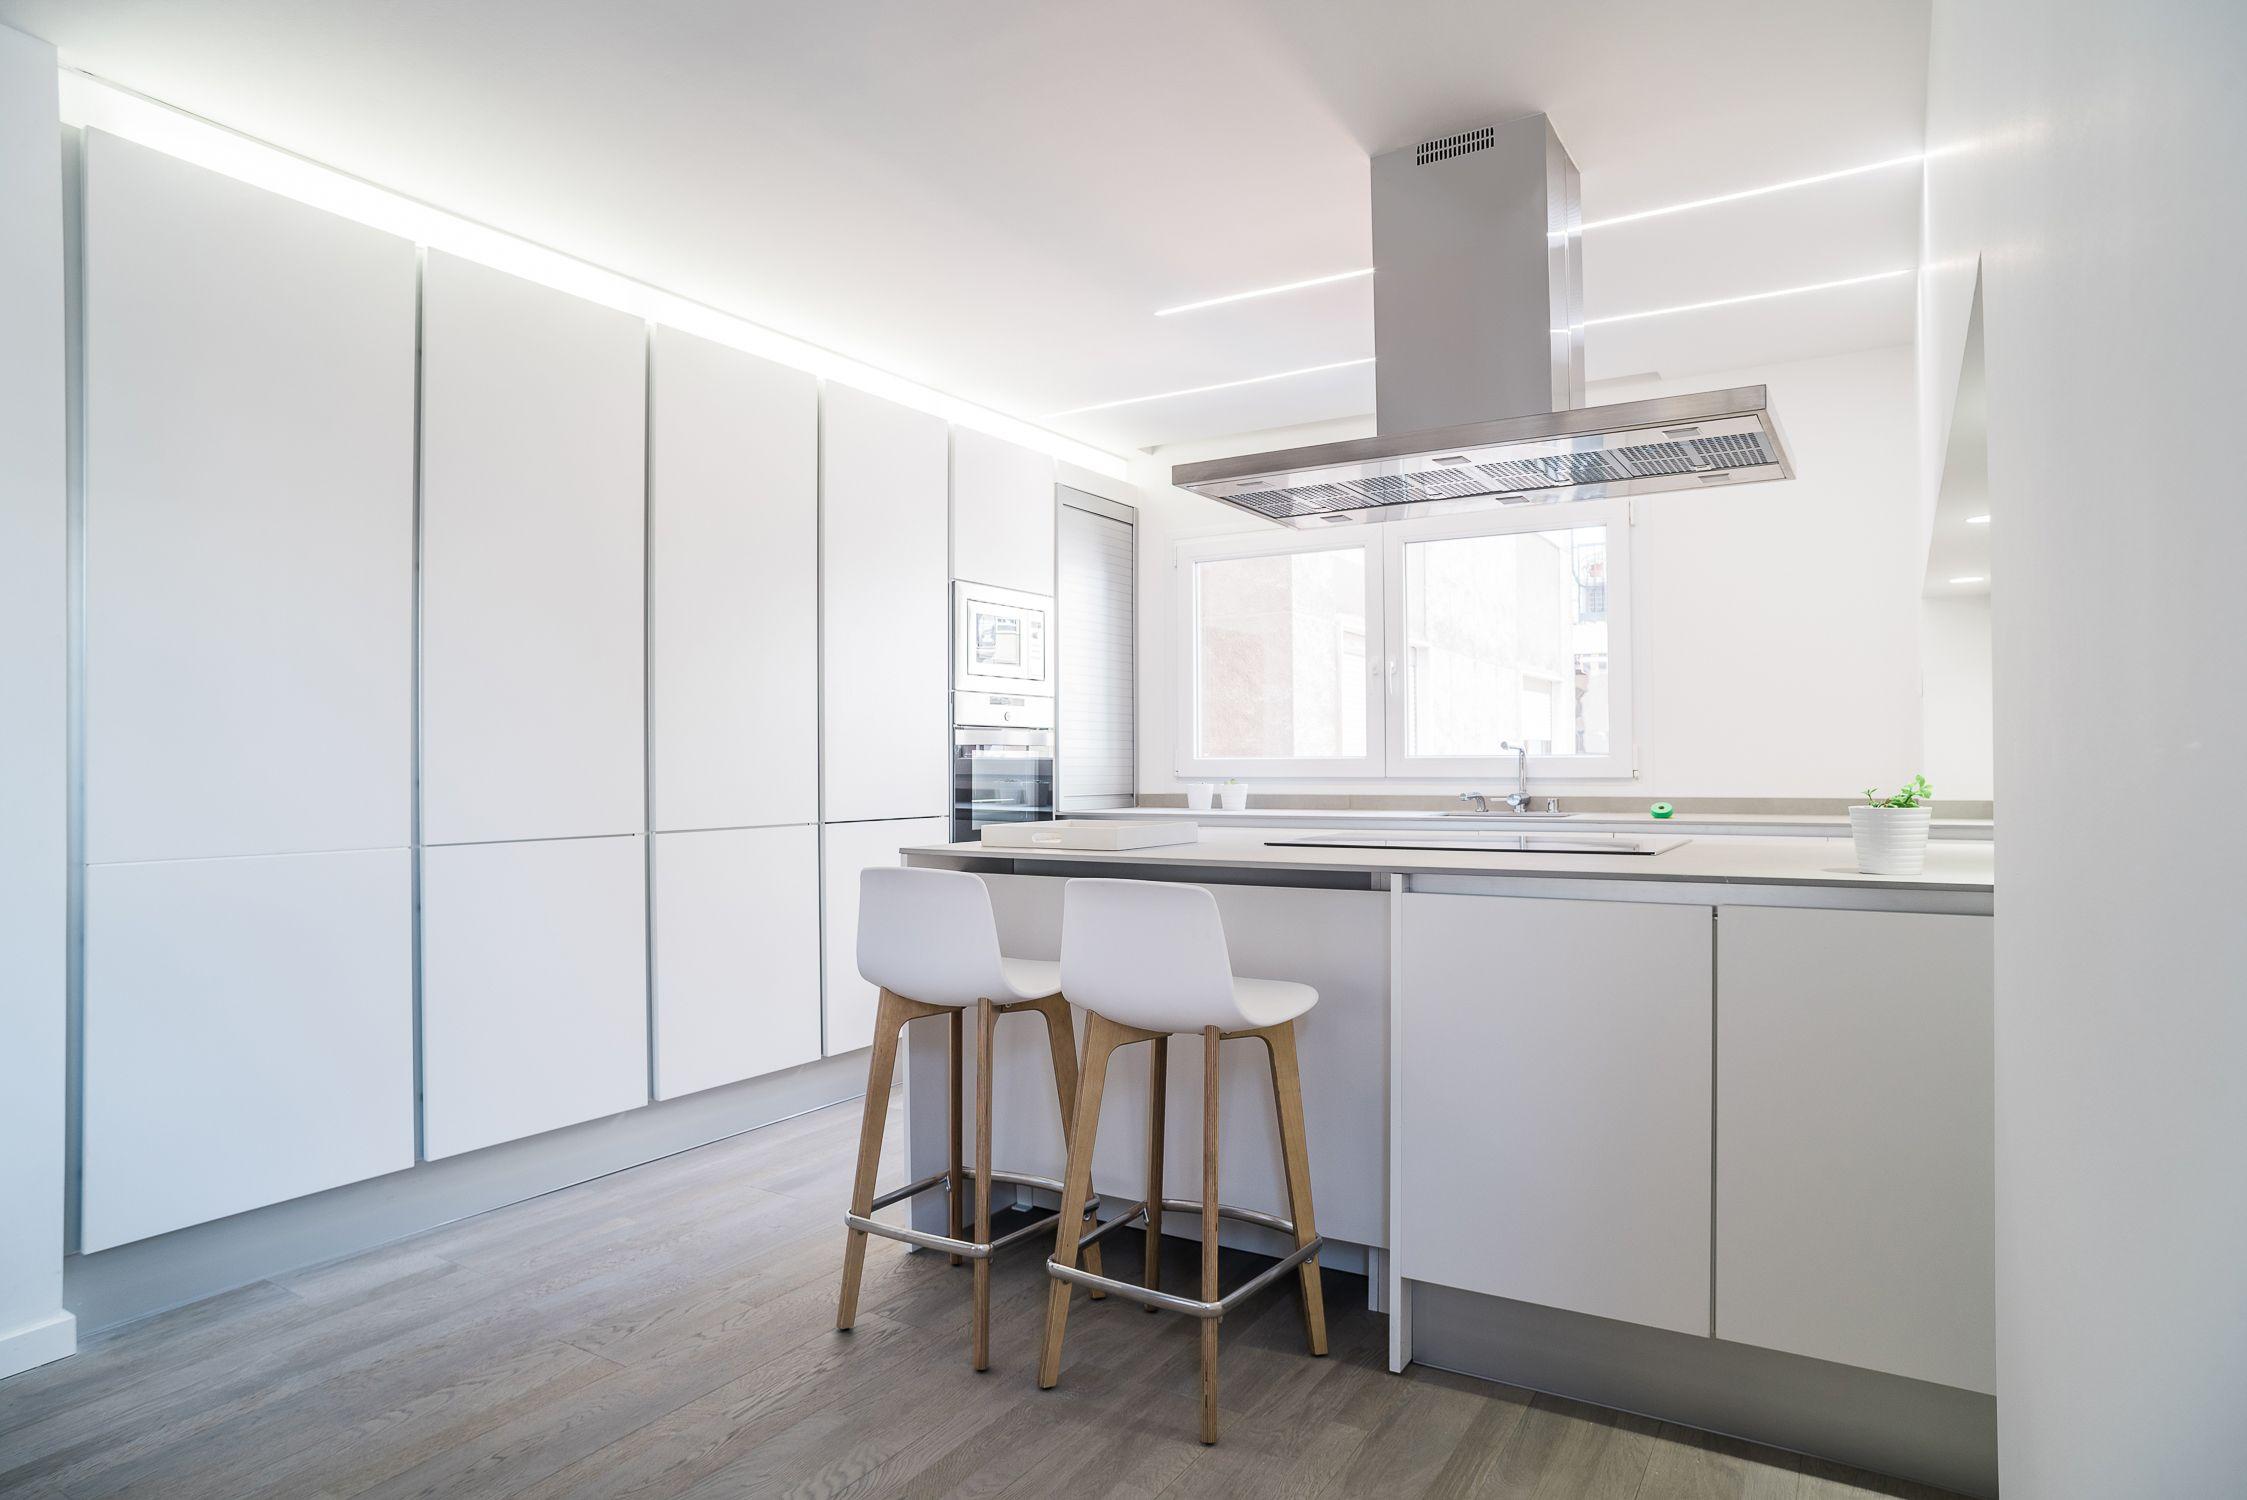 Cocina iluminaci n led integrada en la parte superior de - Iluminacion cocina led ...